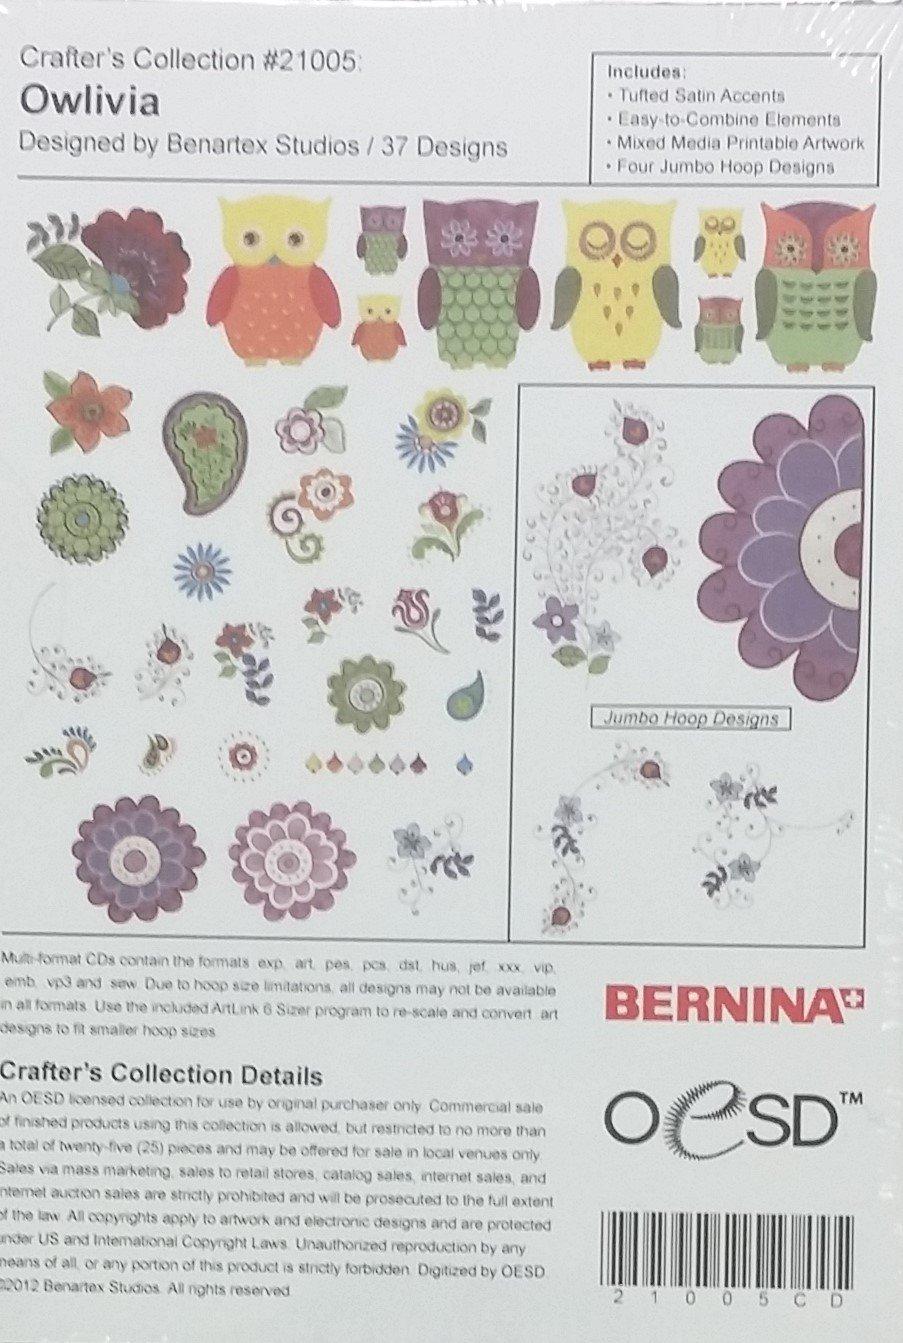 Bernina Exclusive - Owlivia